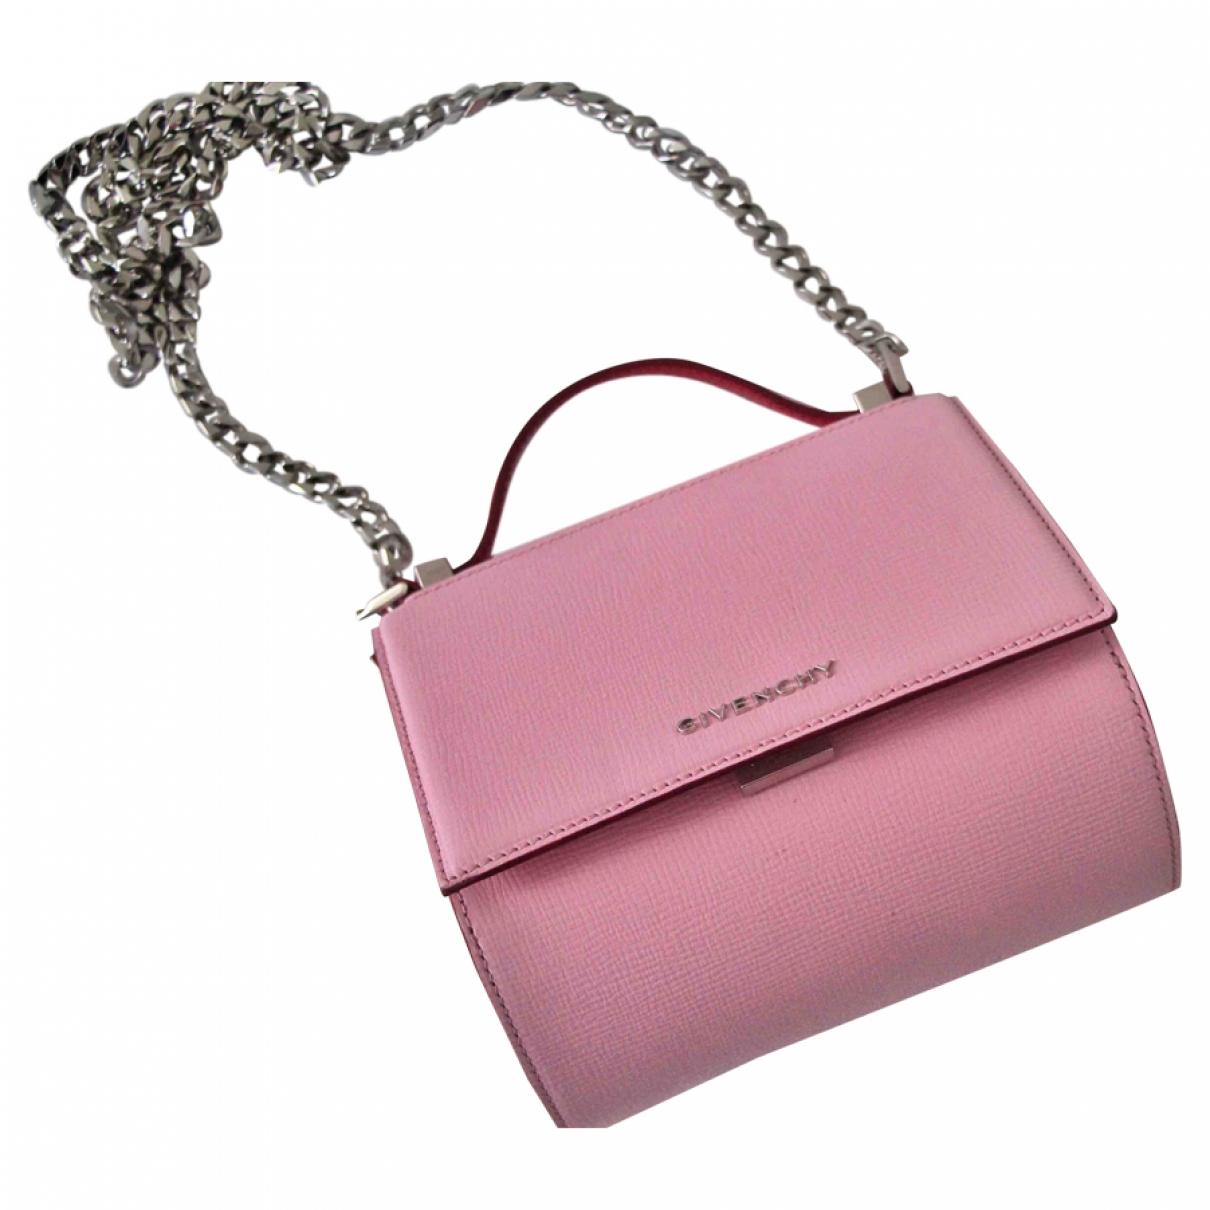 Givenchy - Sac a main Pandora Box pour femme en cuir - rose